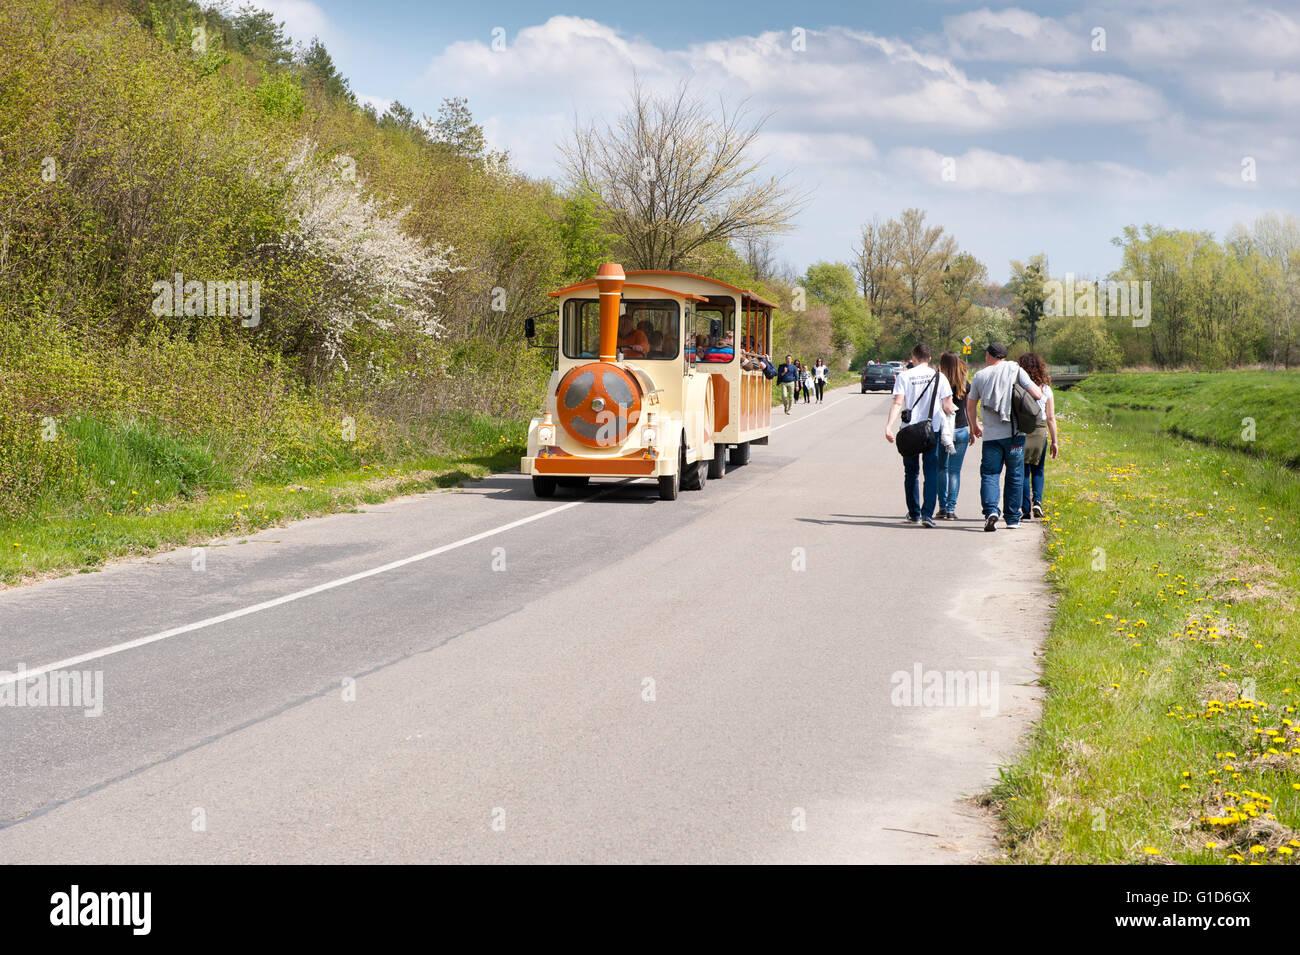 Excursion passenger locomotive tour to Janowiec near Kazimierz Dolny, Poland, Europe, local choo choo vehicle train - Stock Image